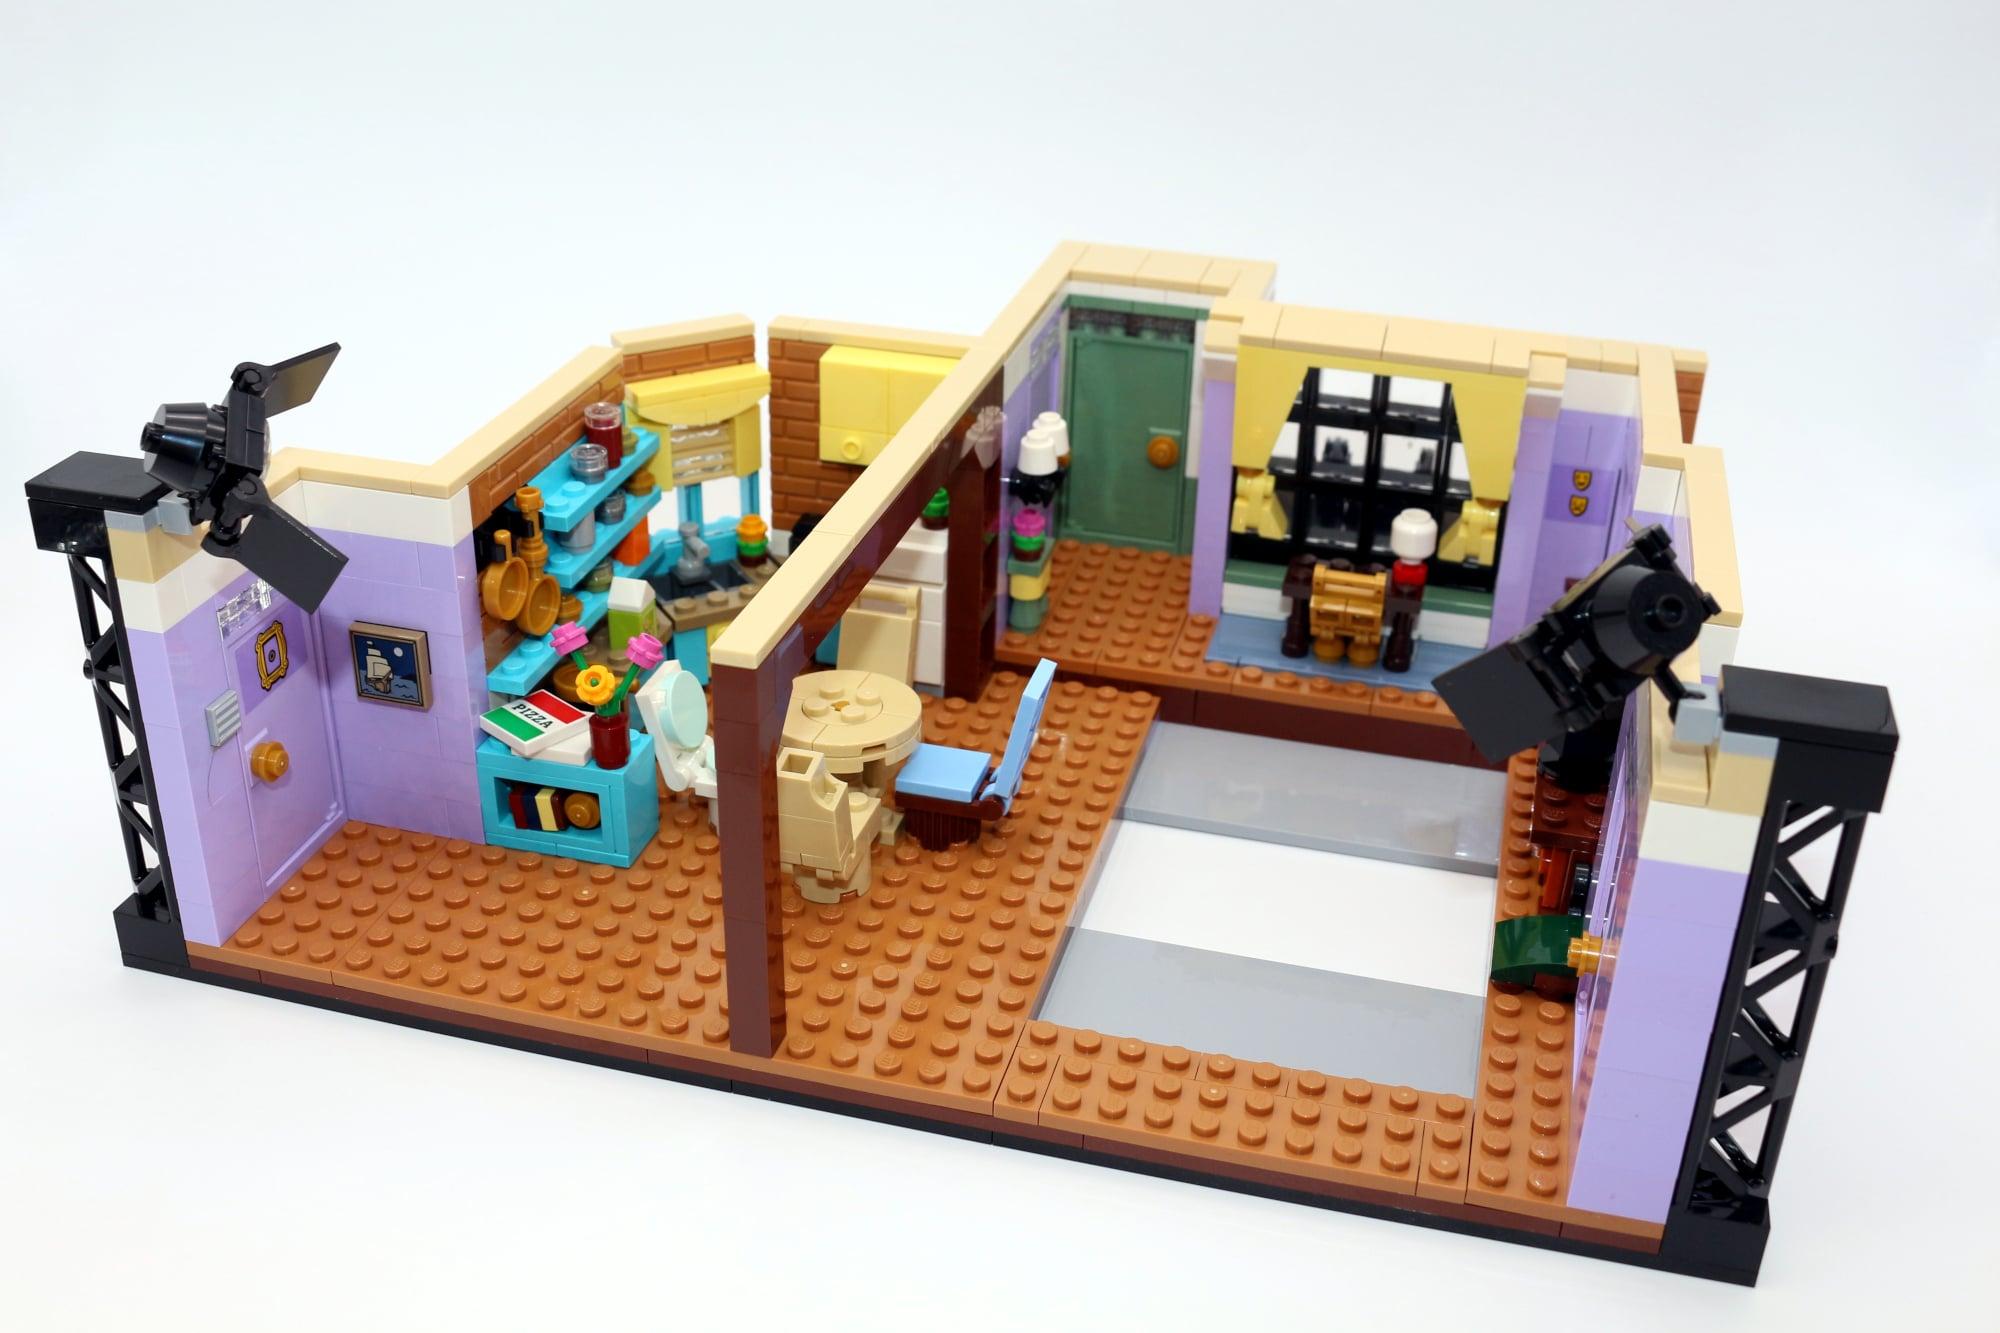 LEGO Friends 10292 The Friends Apartments 44